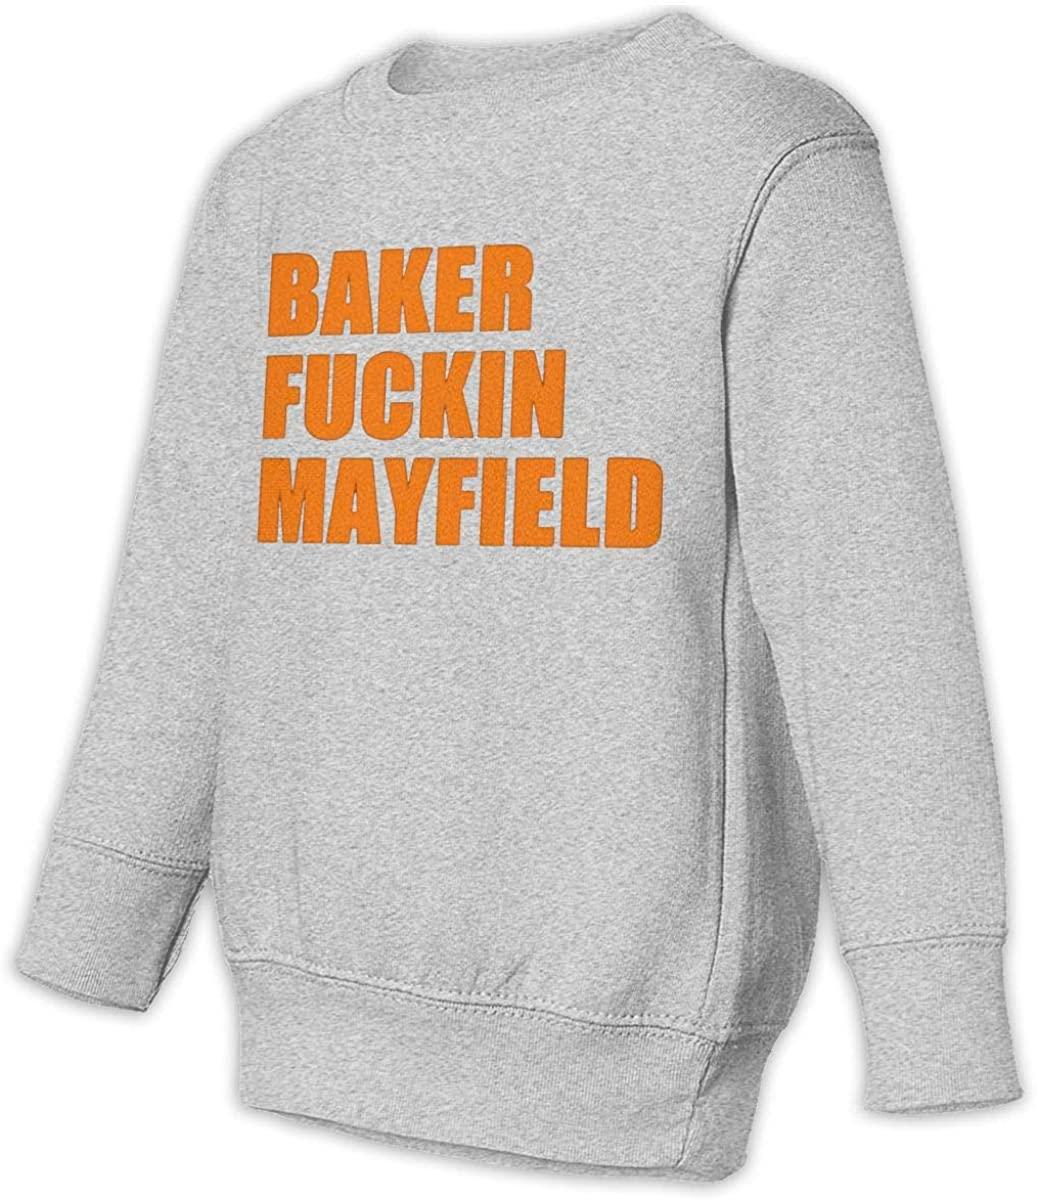 Baker Fckn Mayfield Toddler Juvenile Sweatshirt